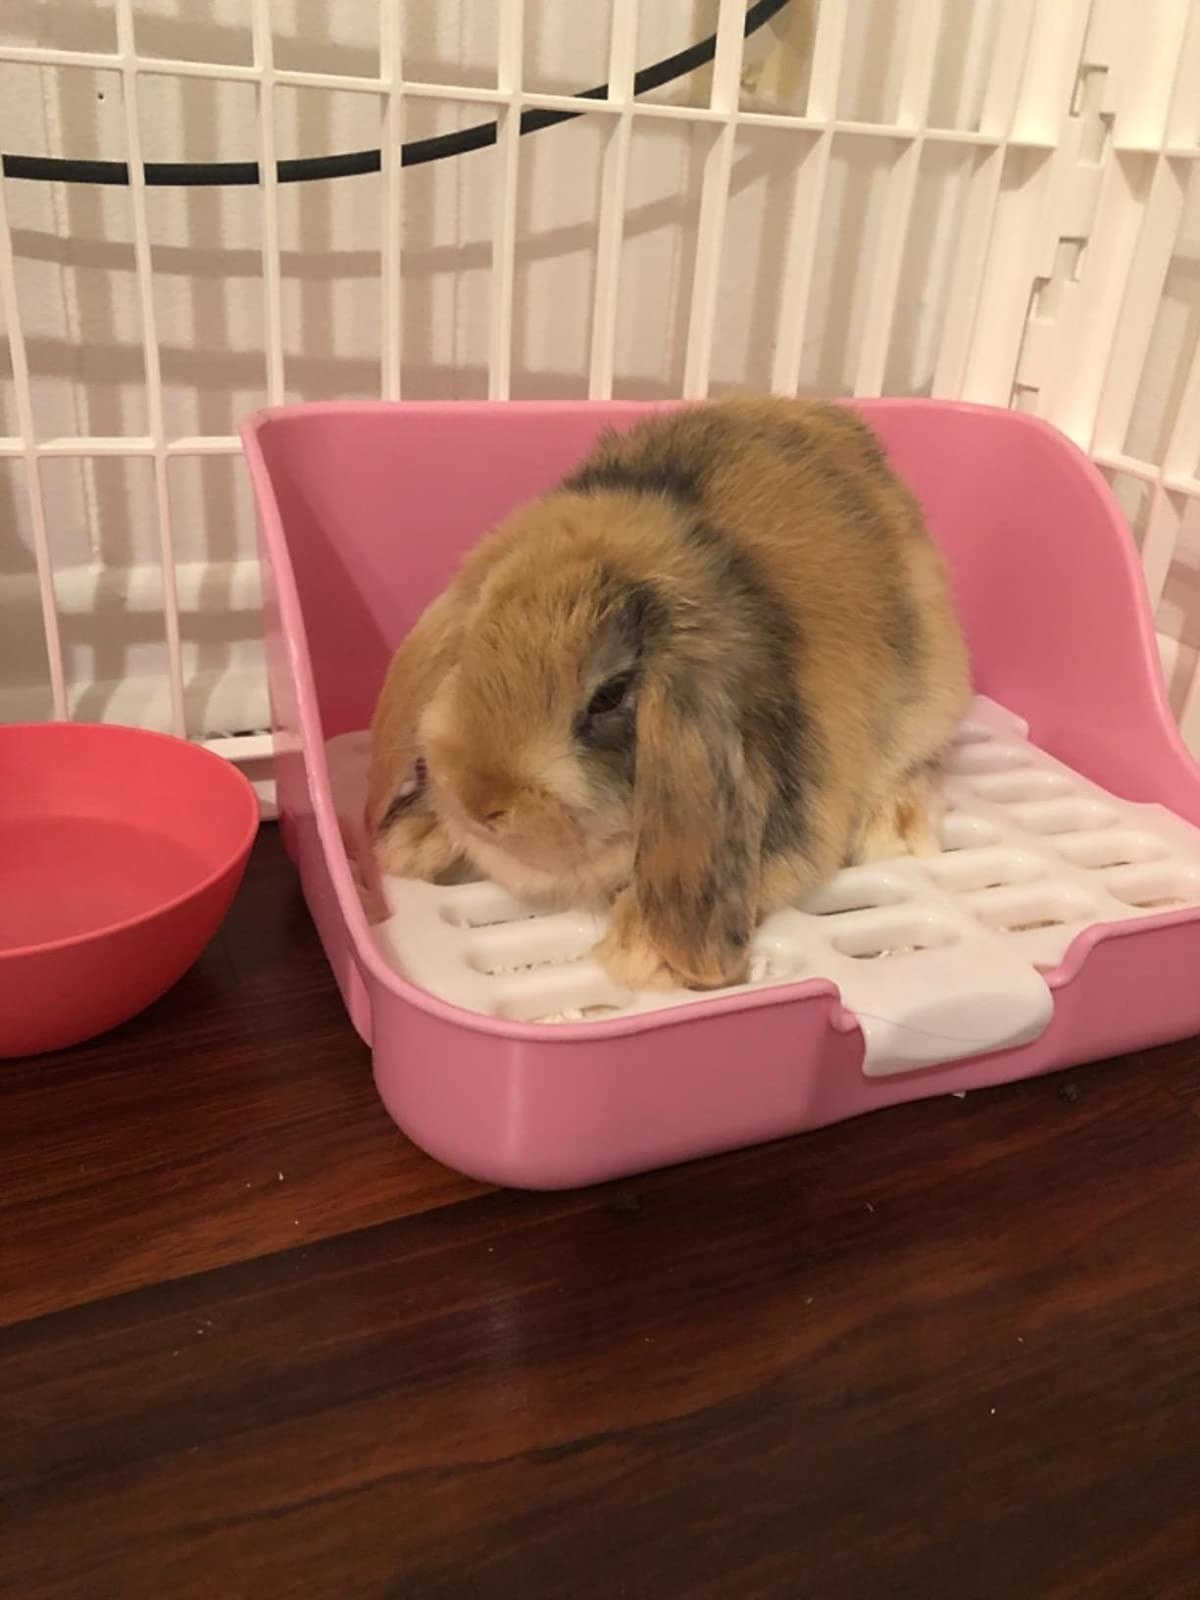 A rabbit uses their litter box